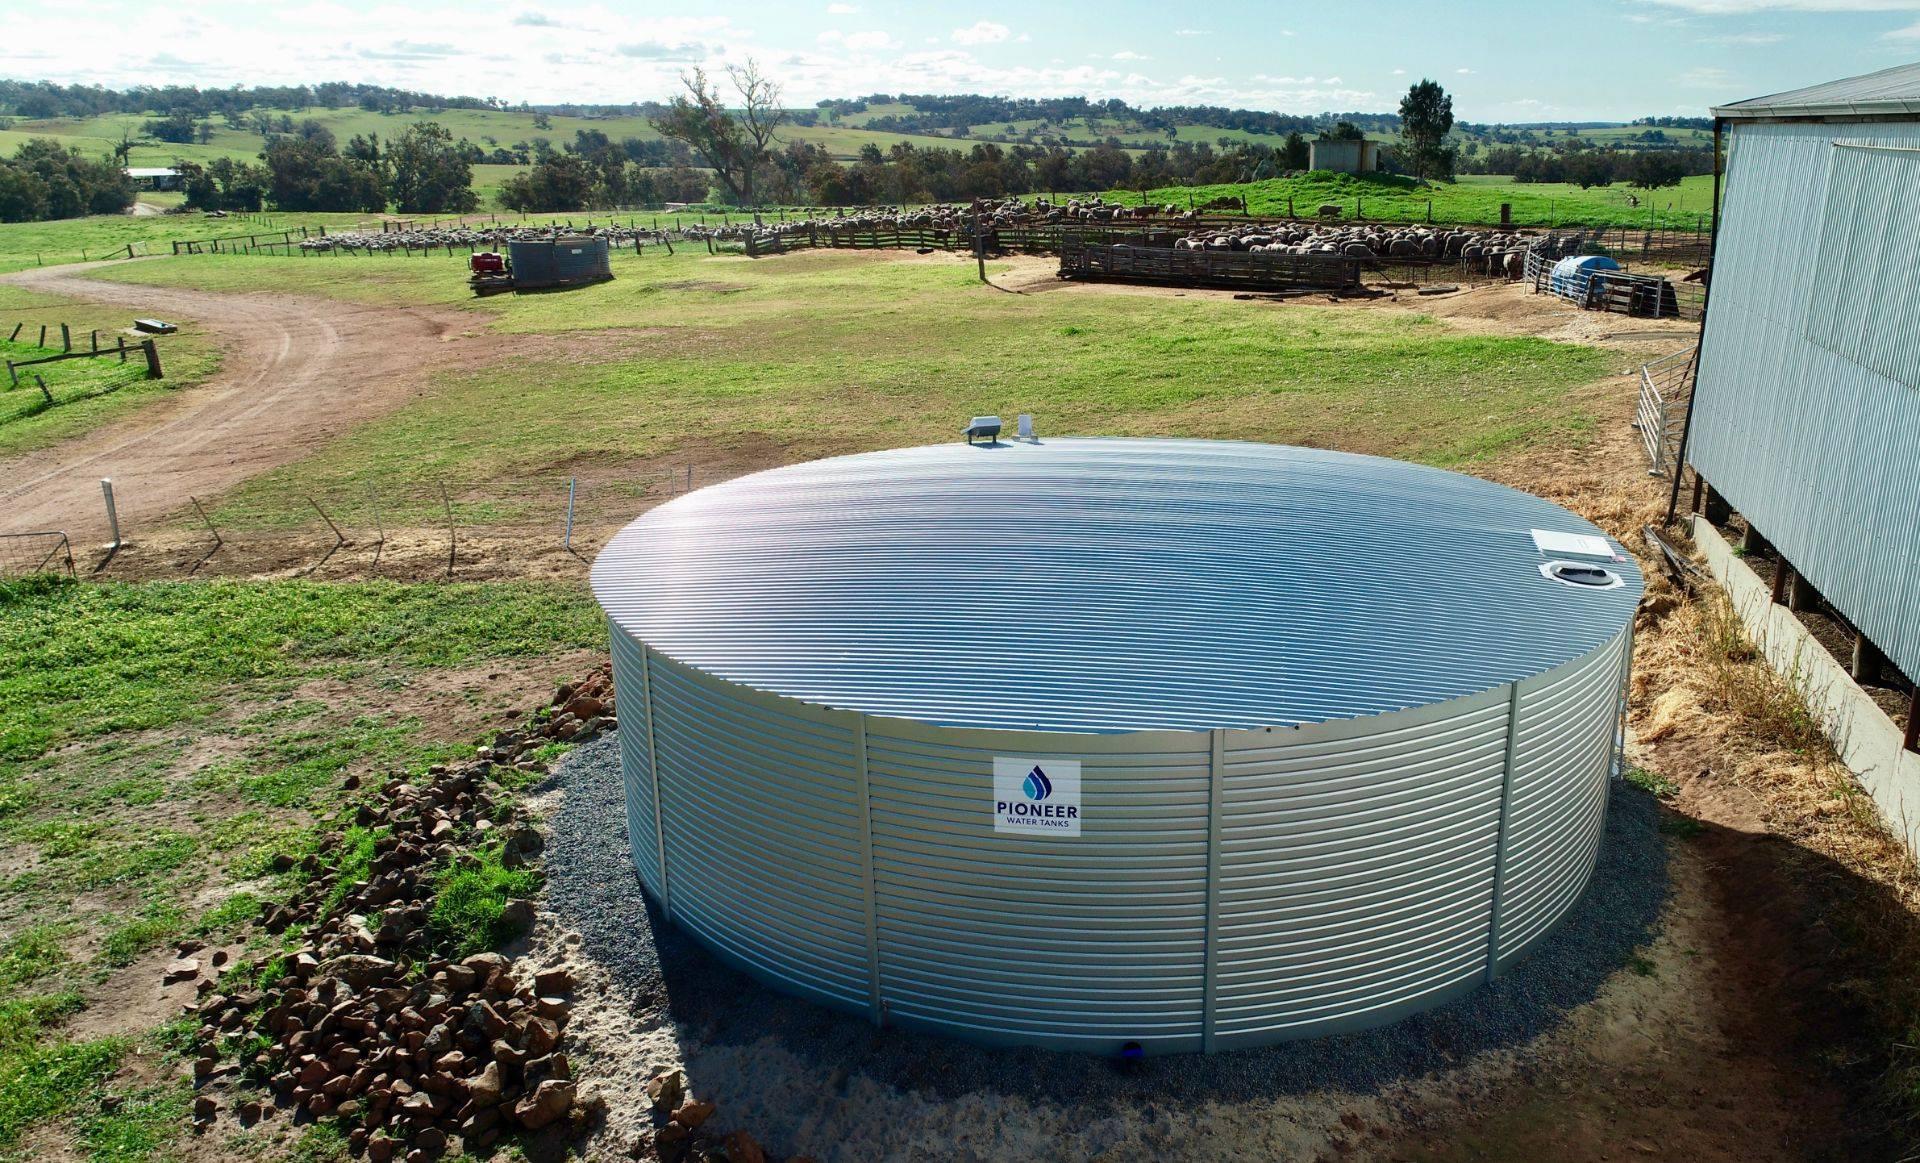 Pioneer rainwater tank on a farm